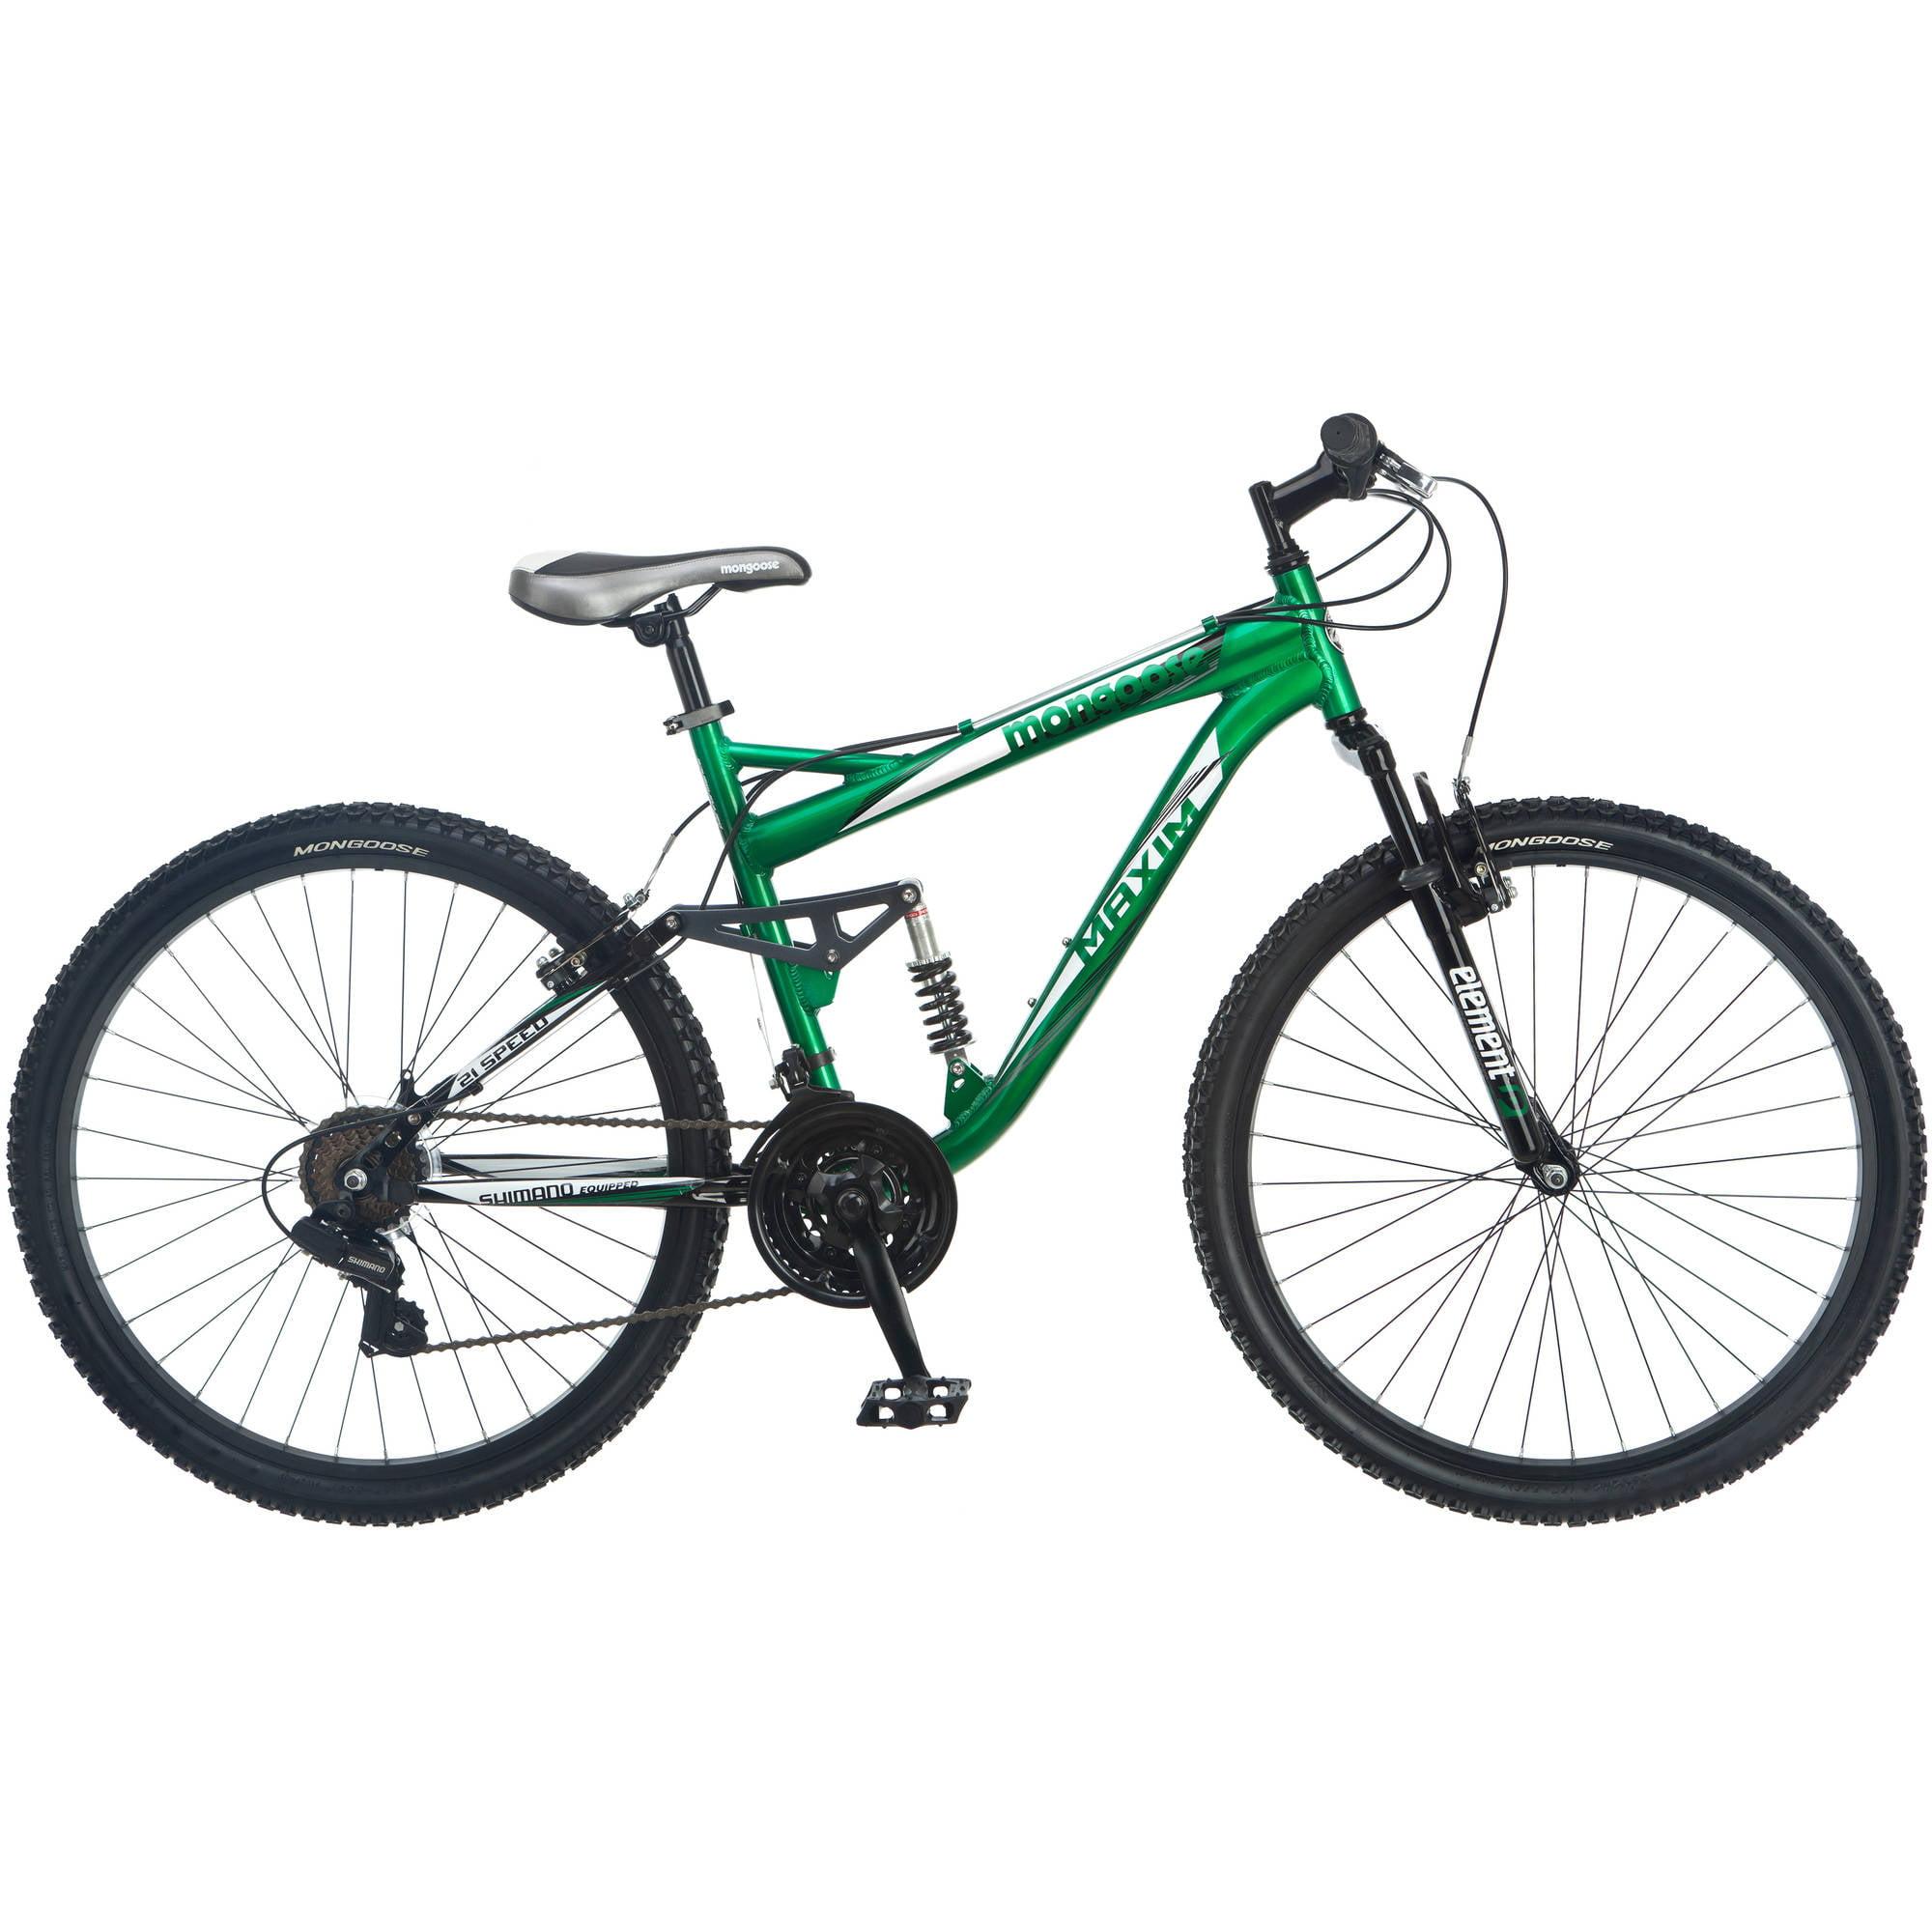 "26"" Mongoose Men's Maxim Mountain Bike, Green"